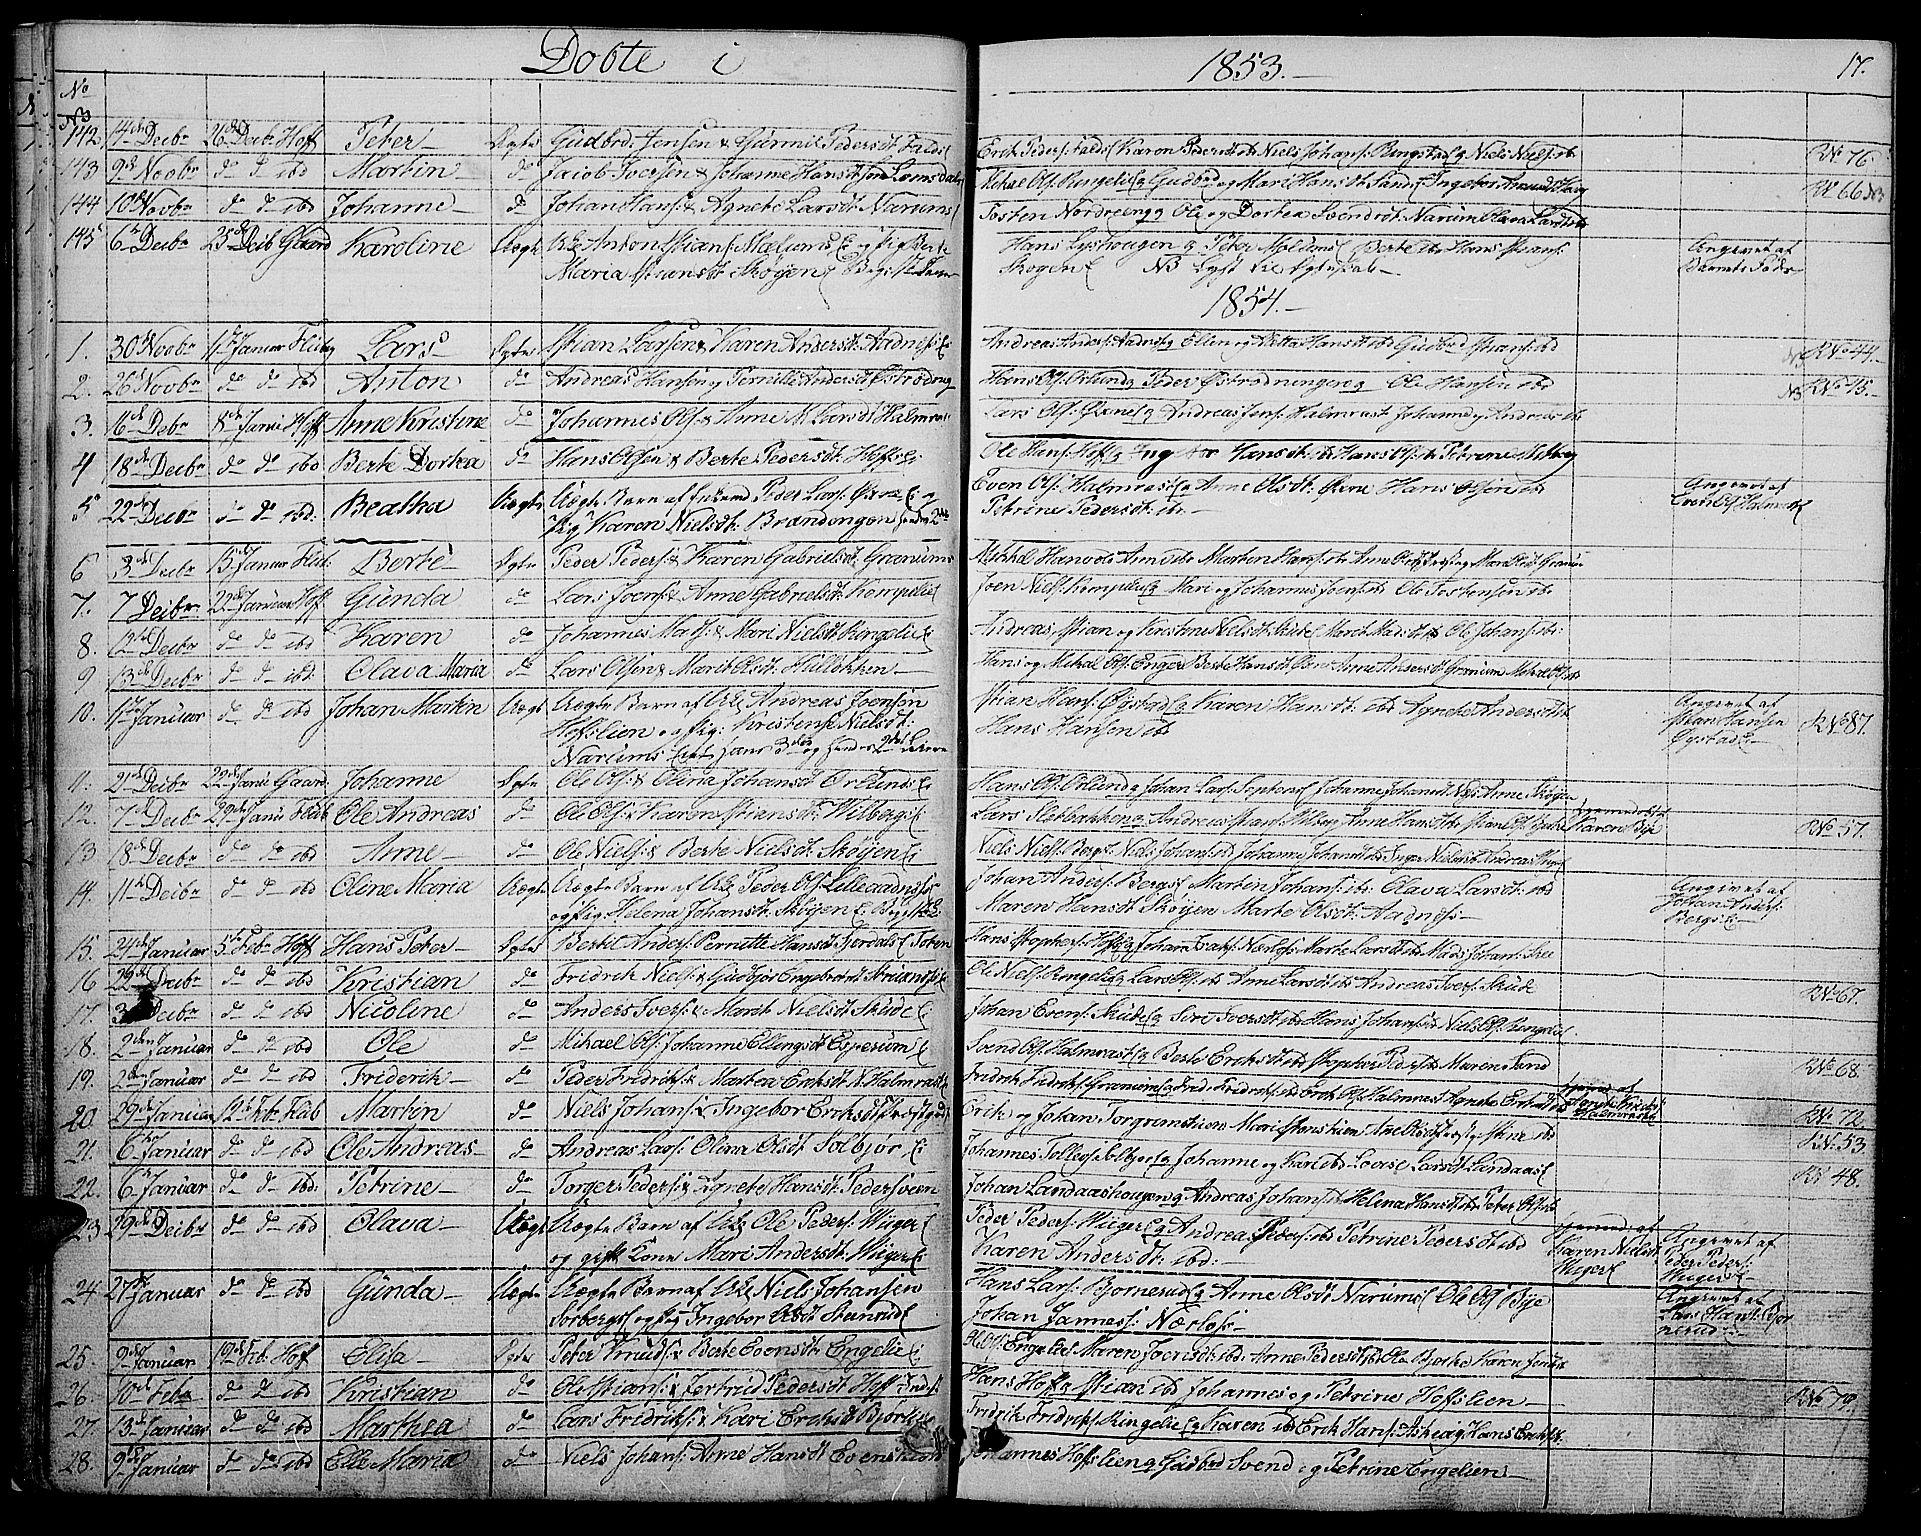 SAH, Søndre Land prestekontor, L/L0001: Klokkerbok nr. 1, 1849-1883, s. 17